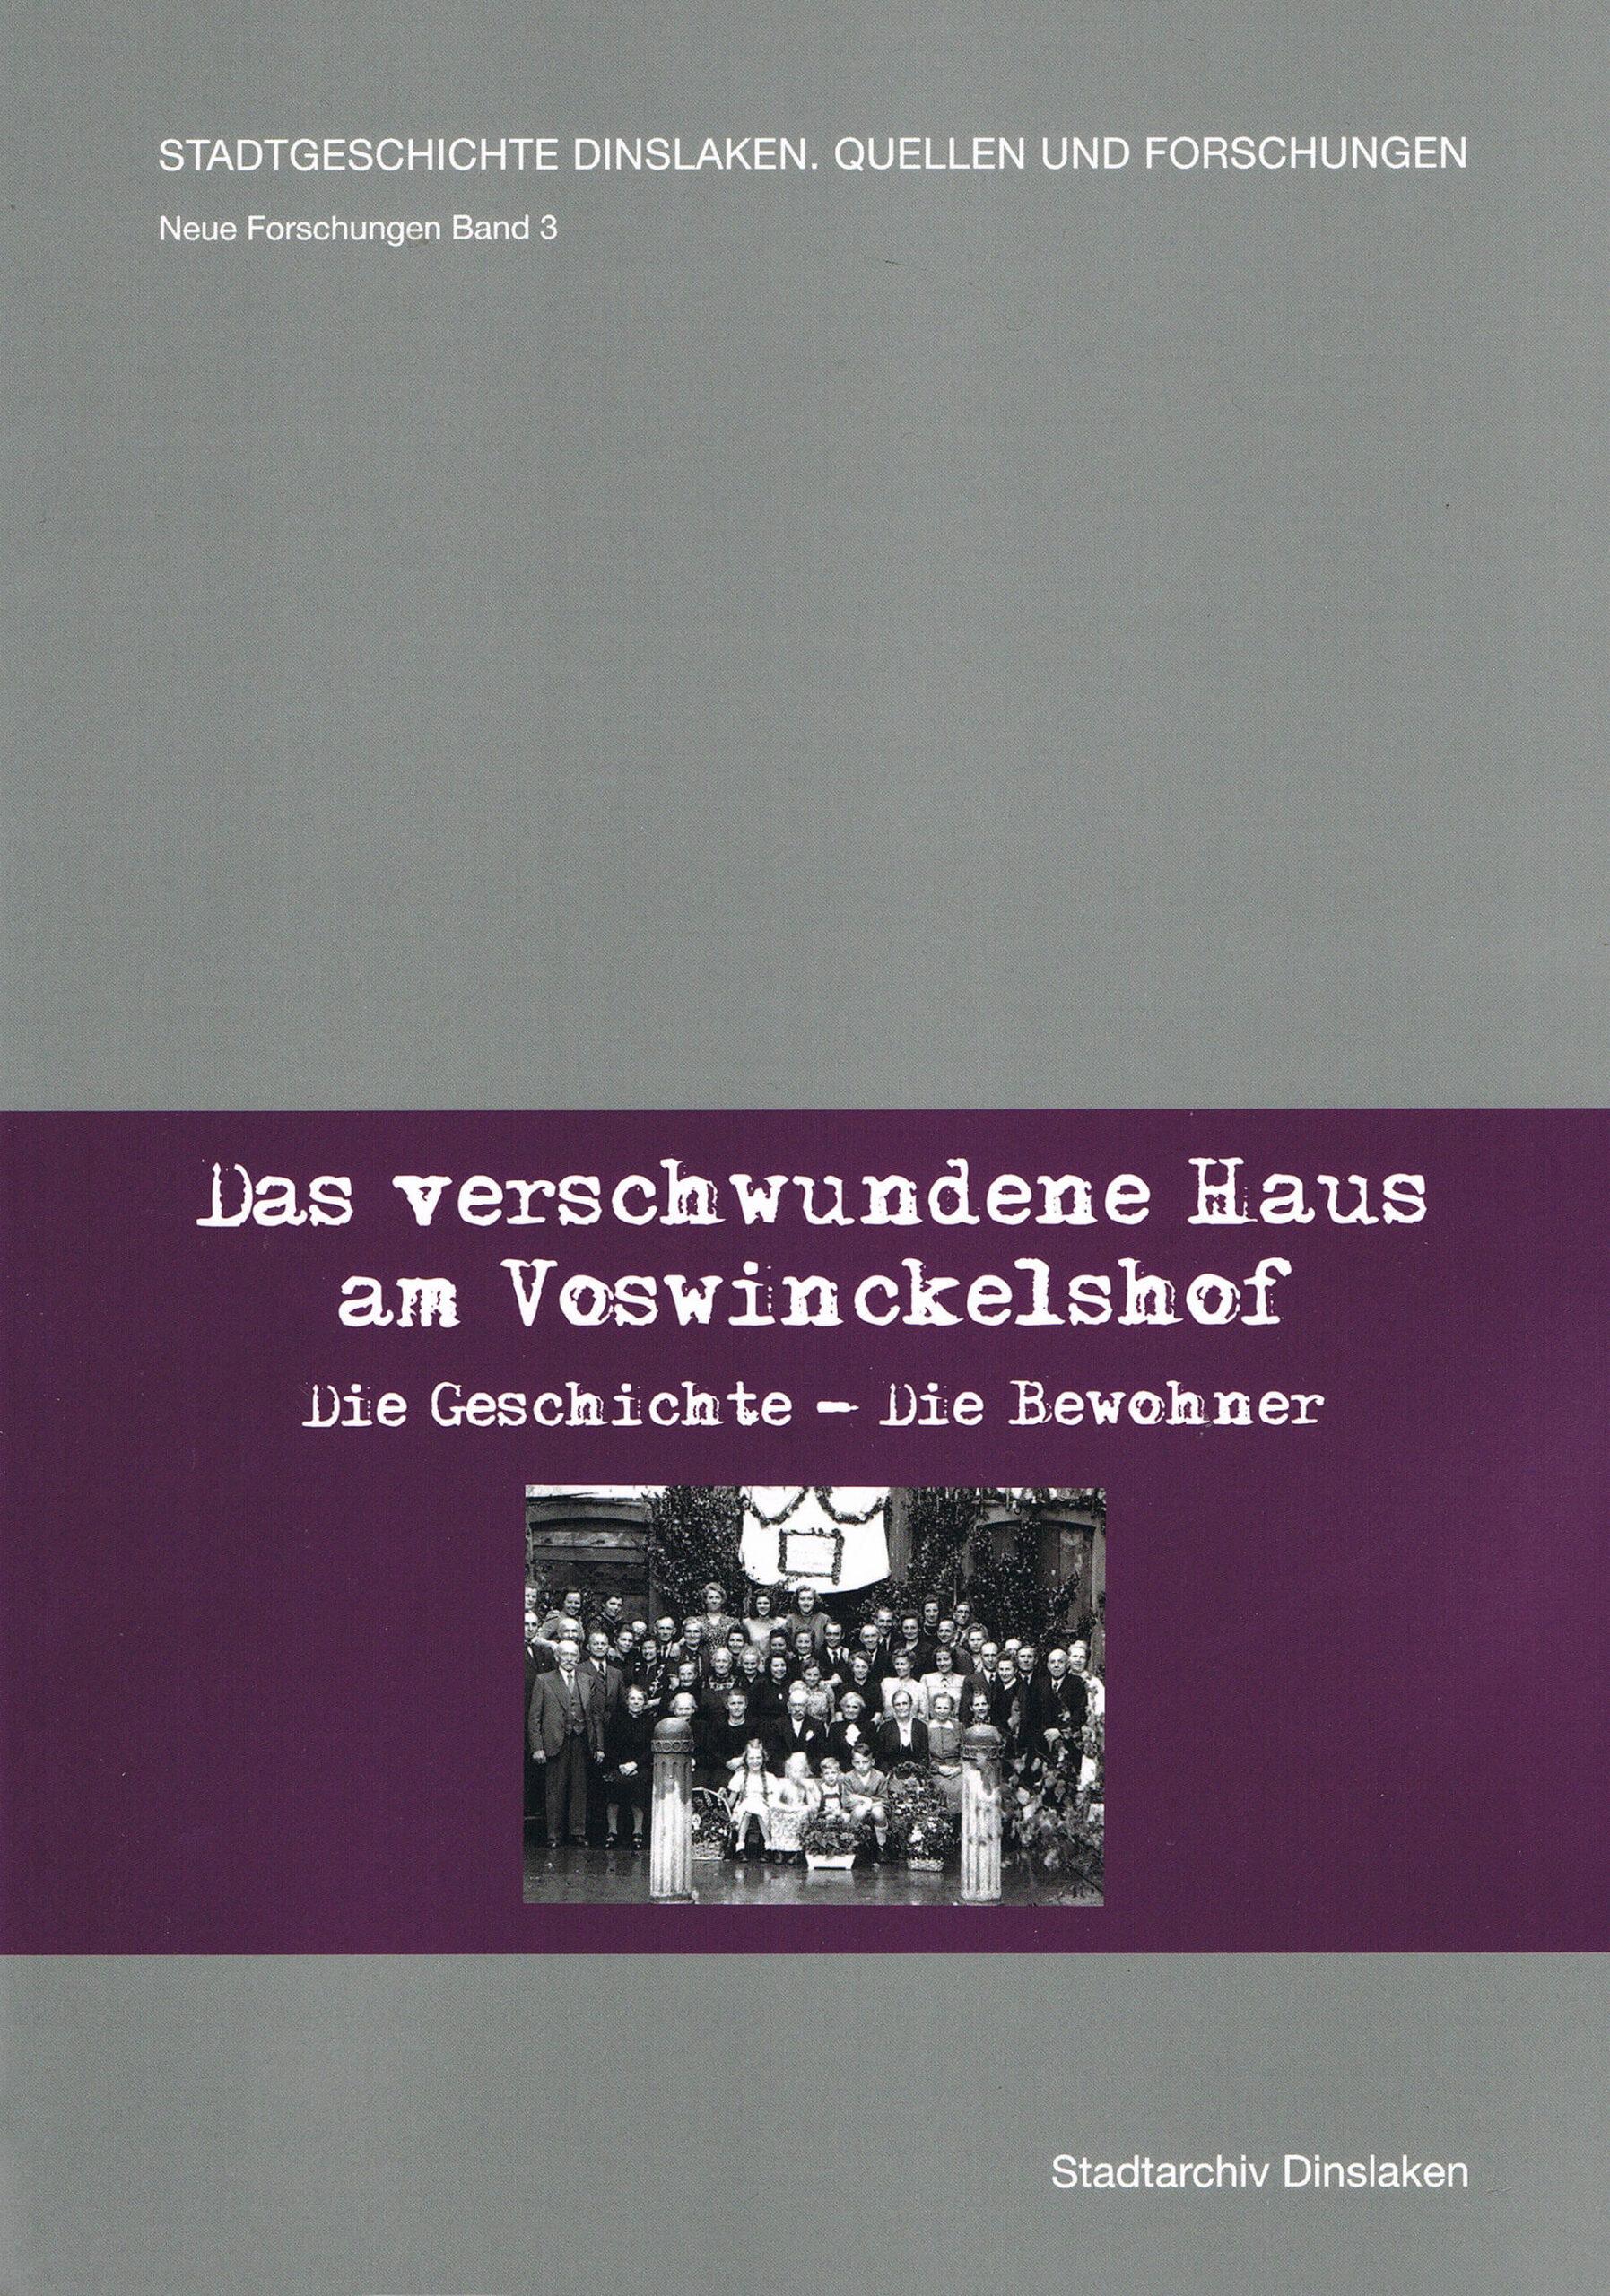 Stadtarchiv Dinslaken - Das verschwundene Haus am Voswinckelshof - Cover